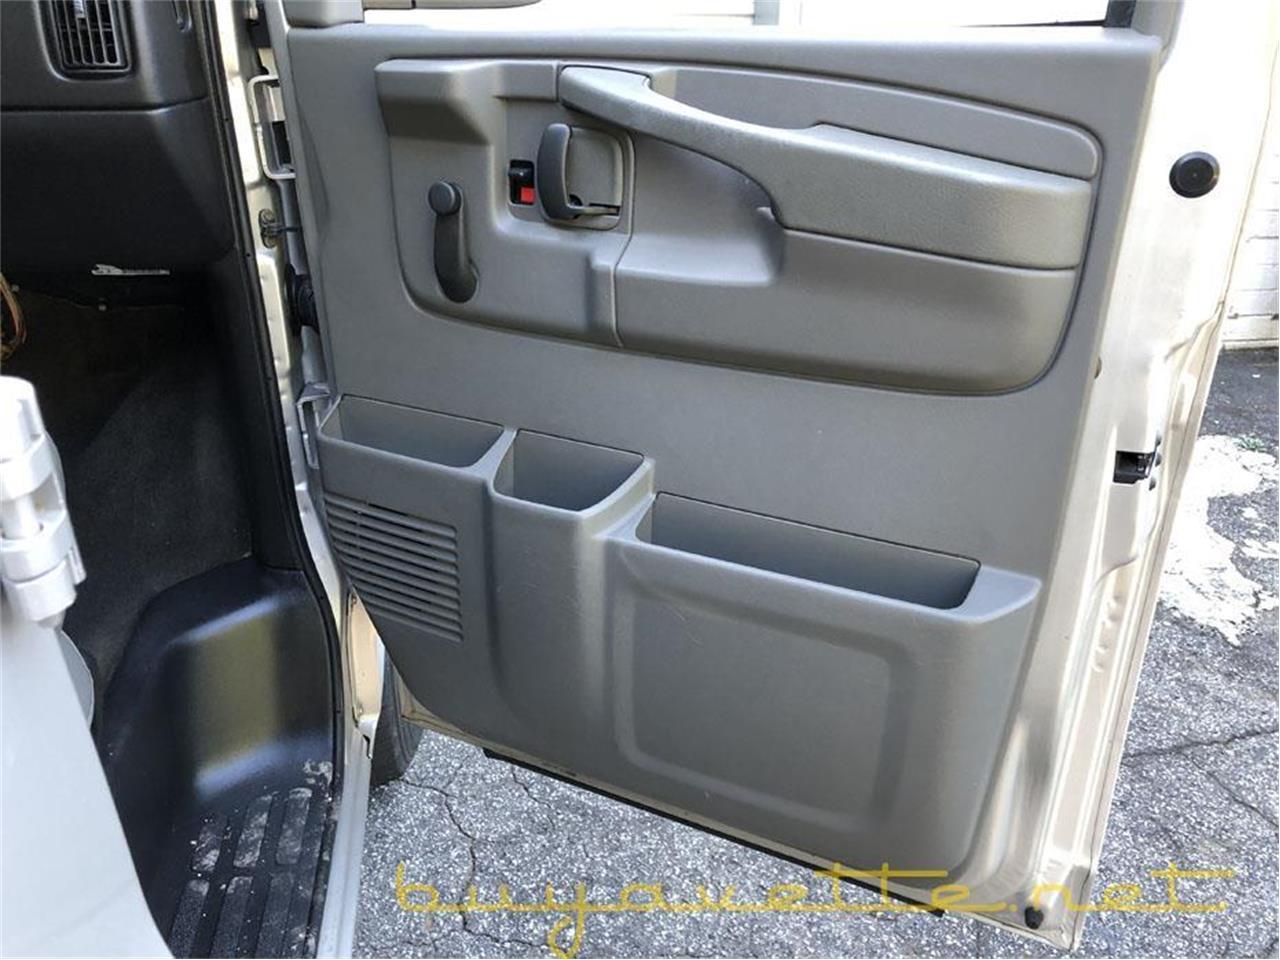 2009 Chevrolet Express (CC-1232559) for sale in Atlanta, Georgia